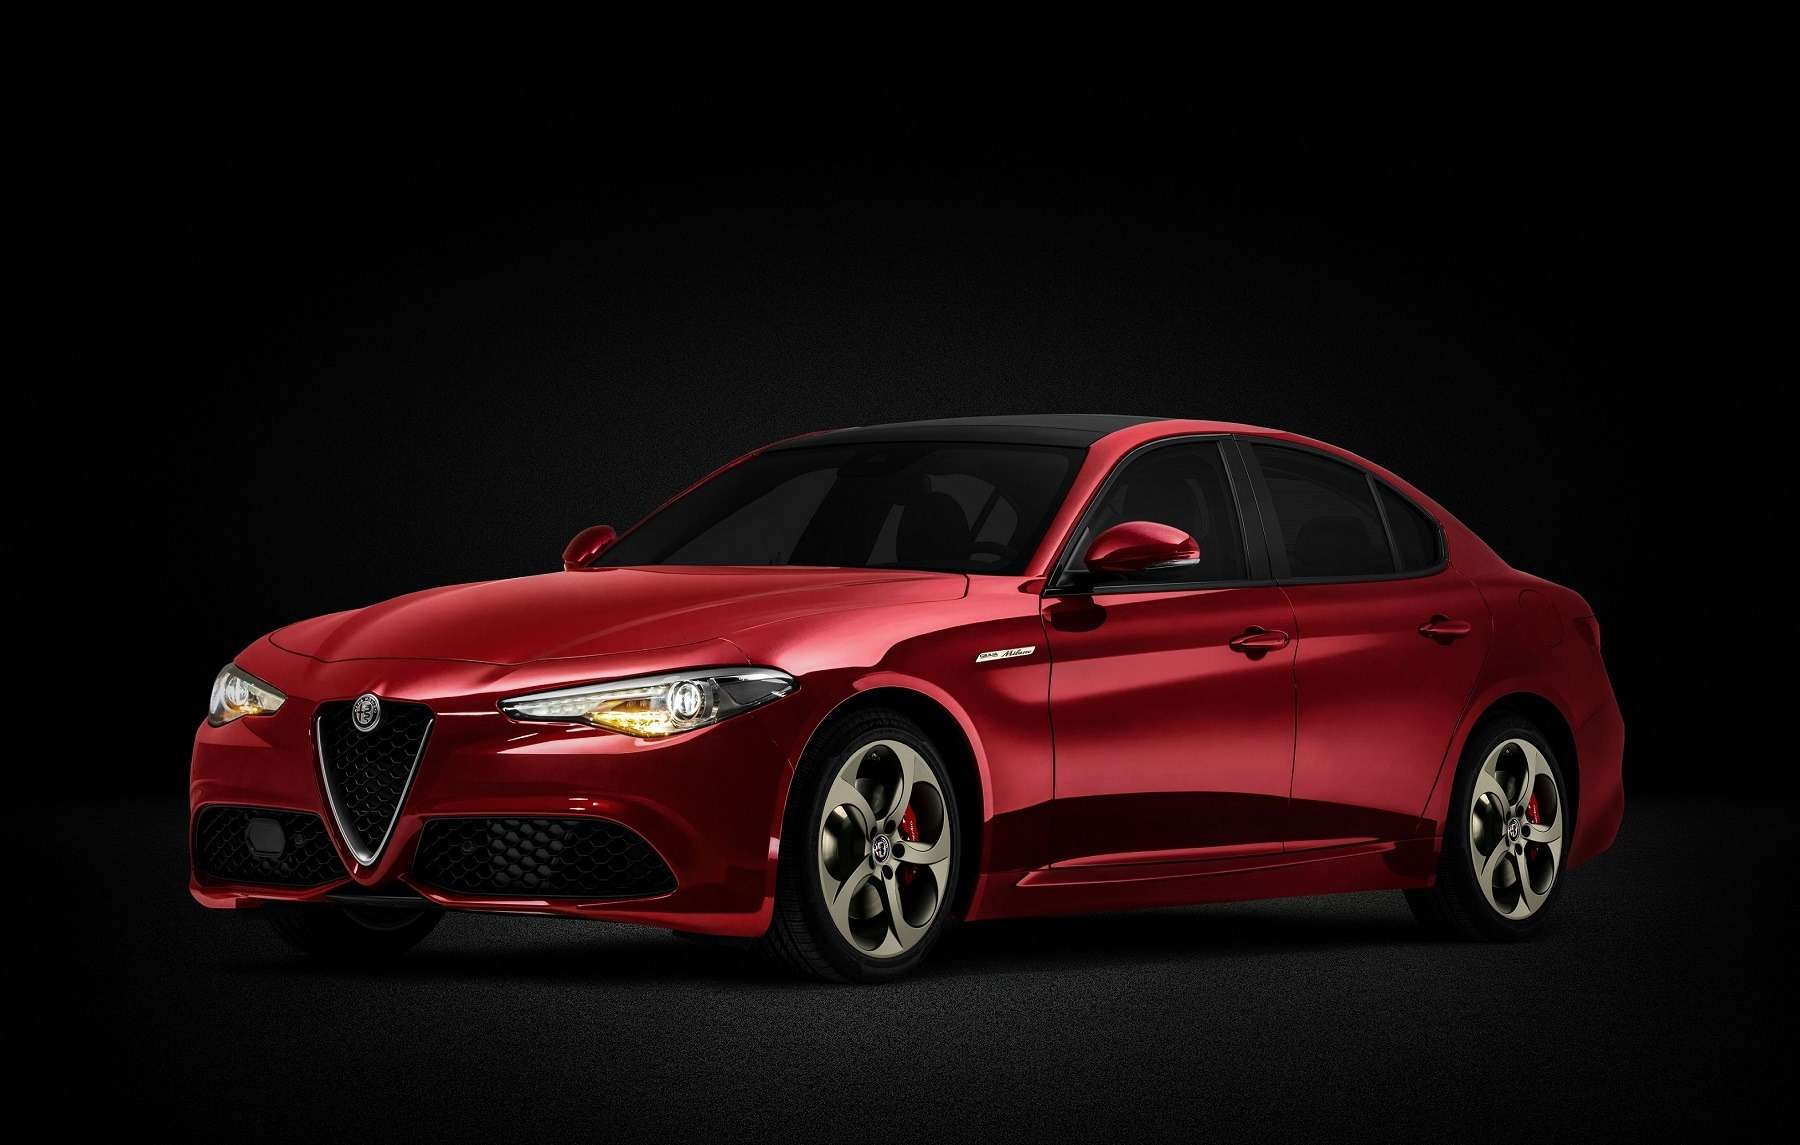 350машин за33секунды: китайцы оценили Alfa Romeo— фото 726162